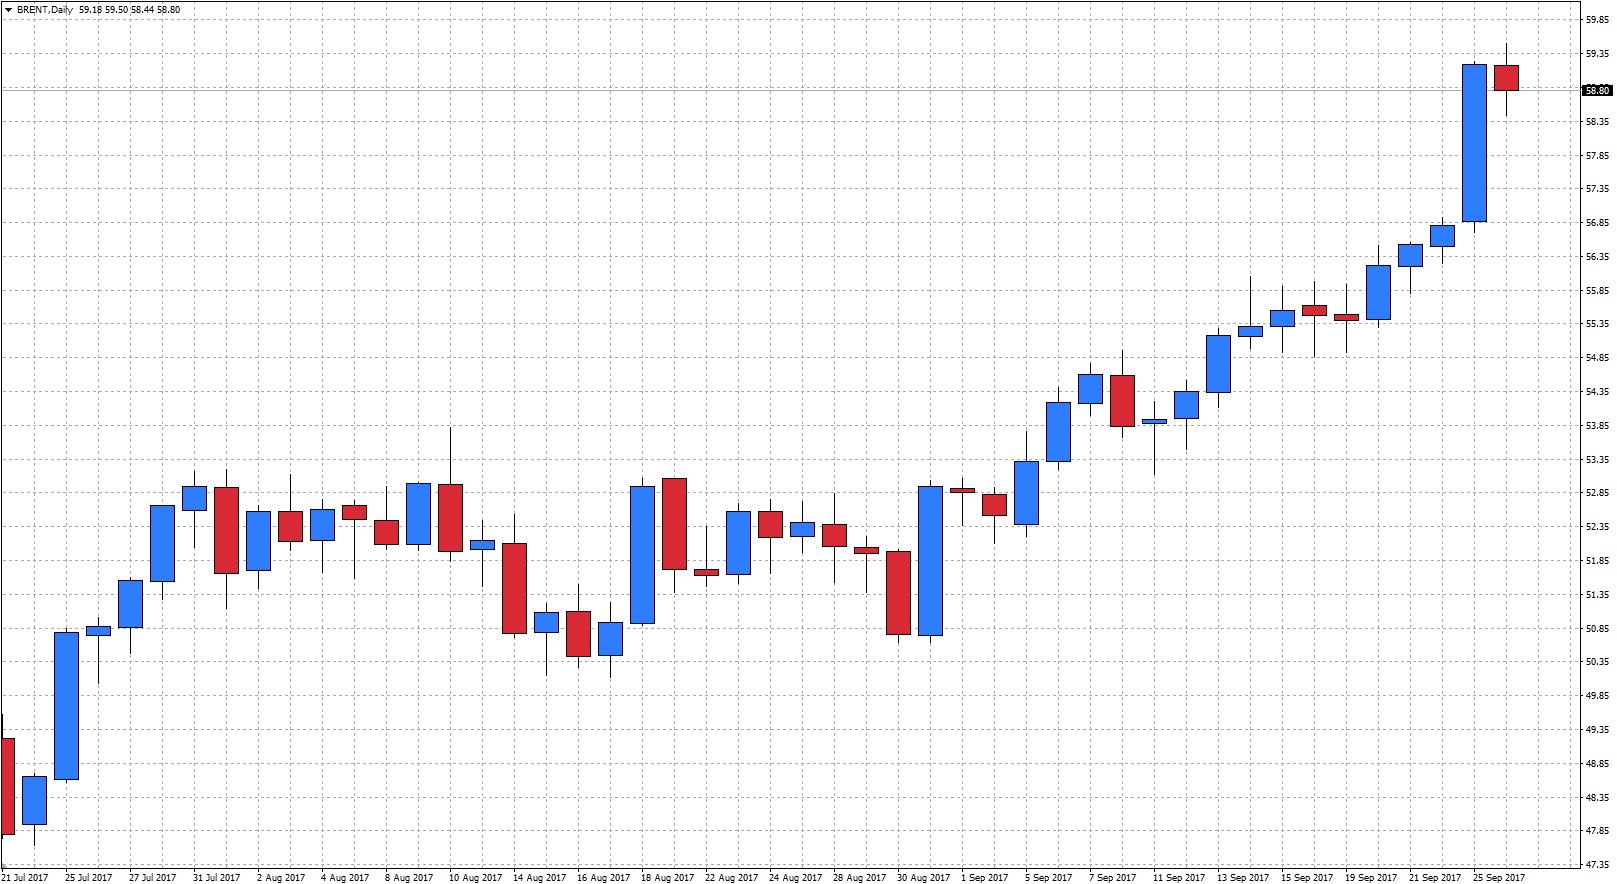 Tendencia terciaria de trading. (corto plazo)